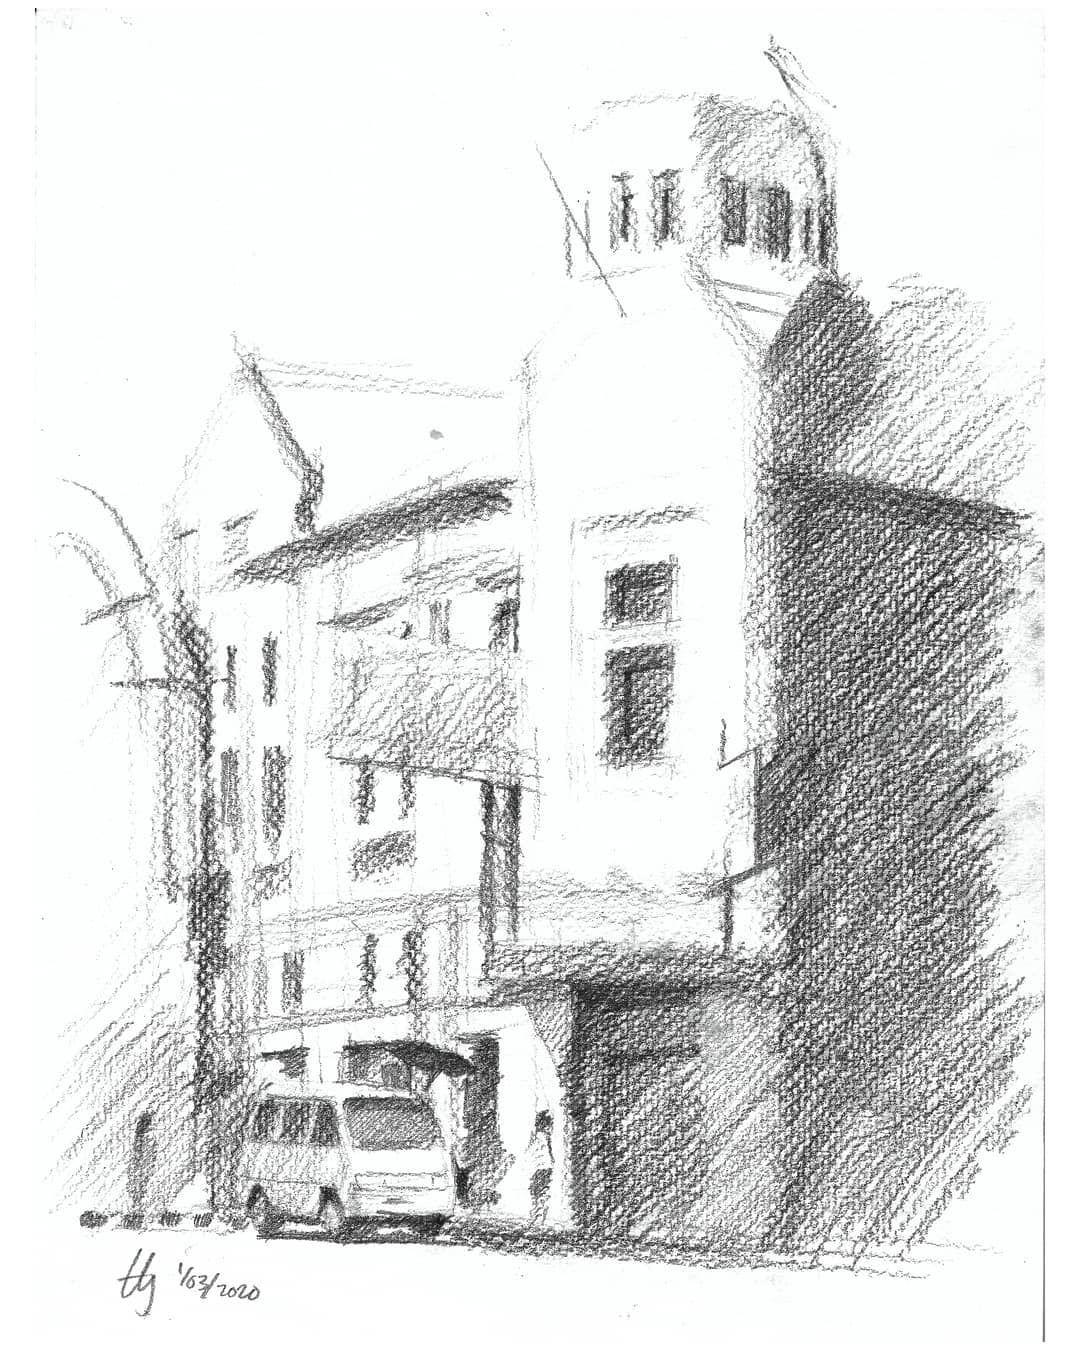 Di Sudut Jalan Banceuy Abc Ini Selalu Bergantian Nongkrong Mobil T120 Carry Zebra Sketsa Bersama Bandungsketchwalk Bsw77 Sketsa Zebra Drawing